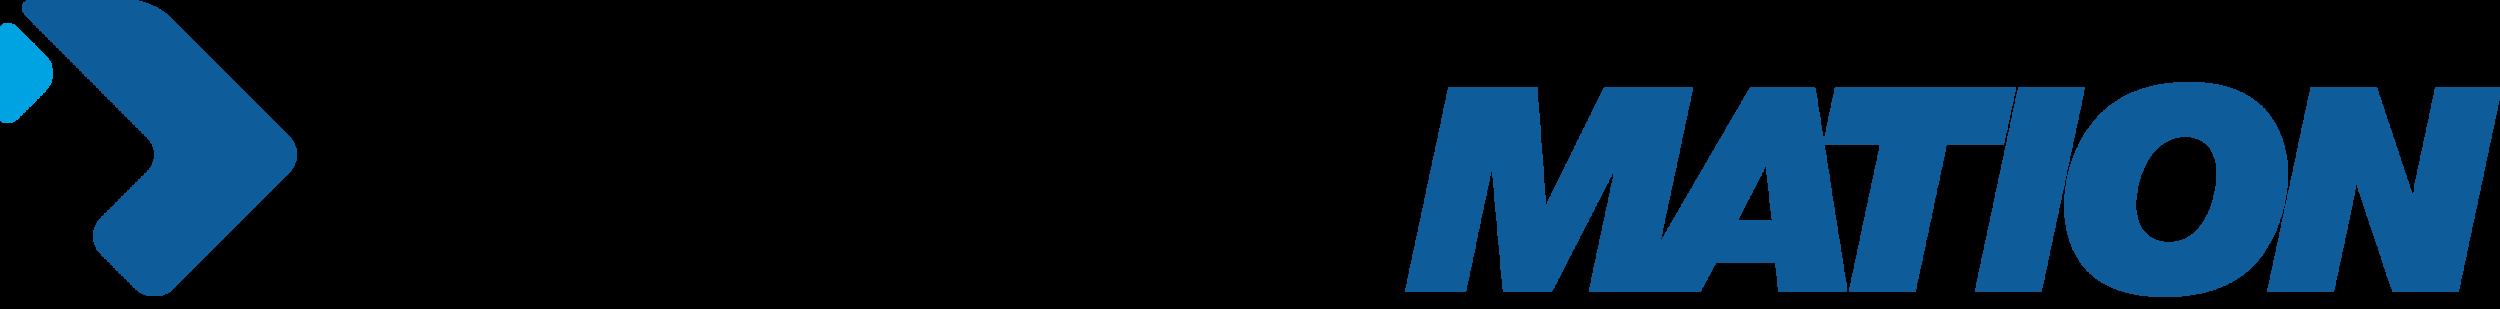 DOCU_logo.png